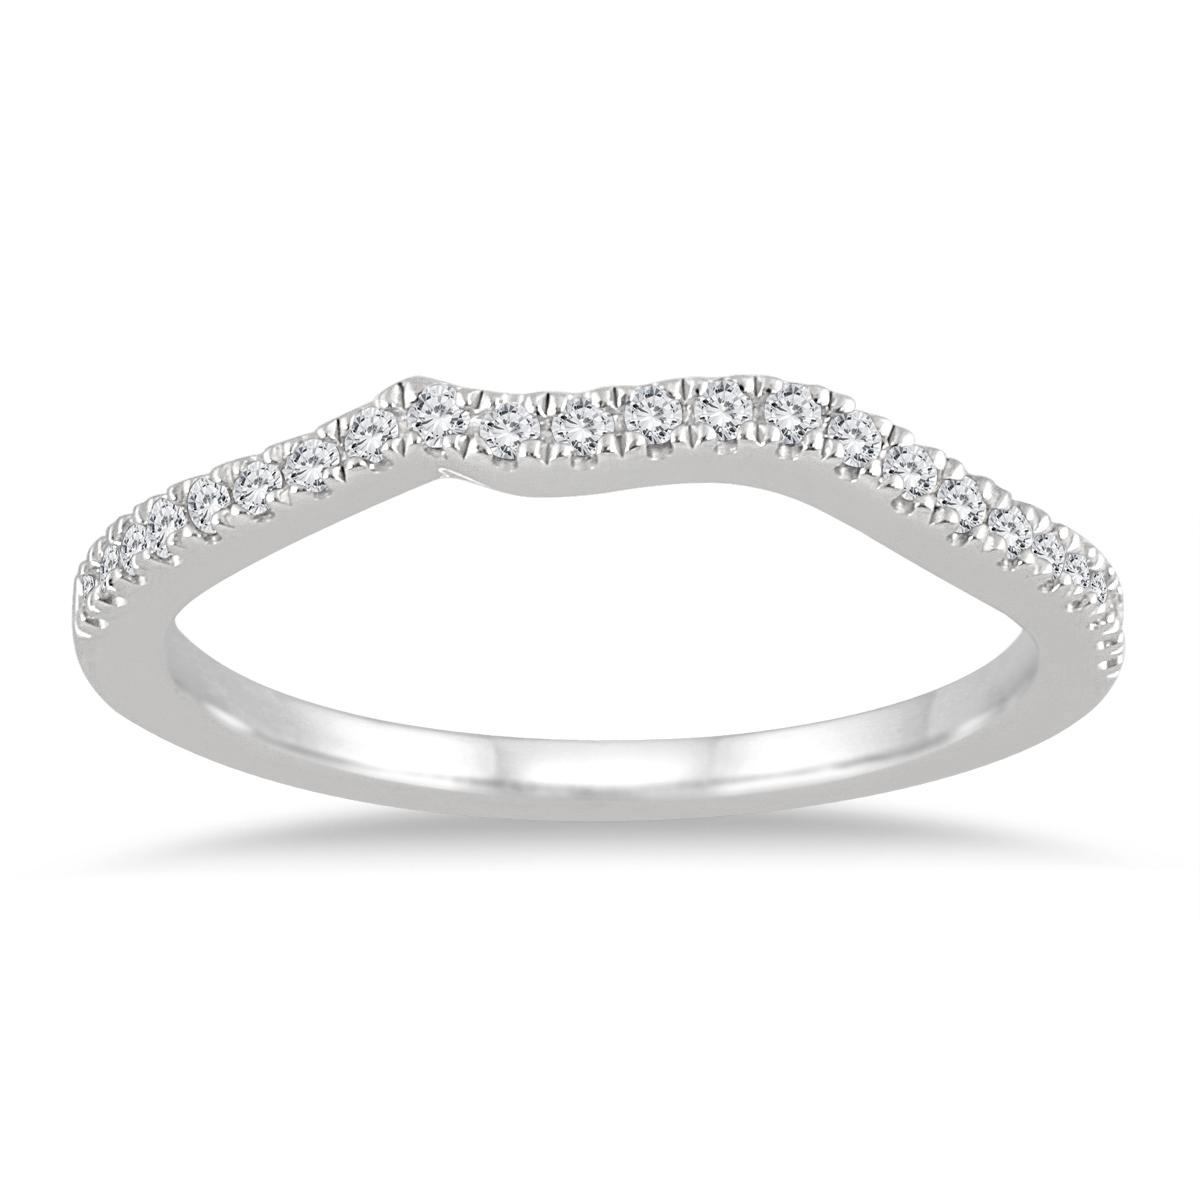 1/10 Carat TW Diamond...